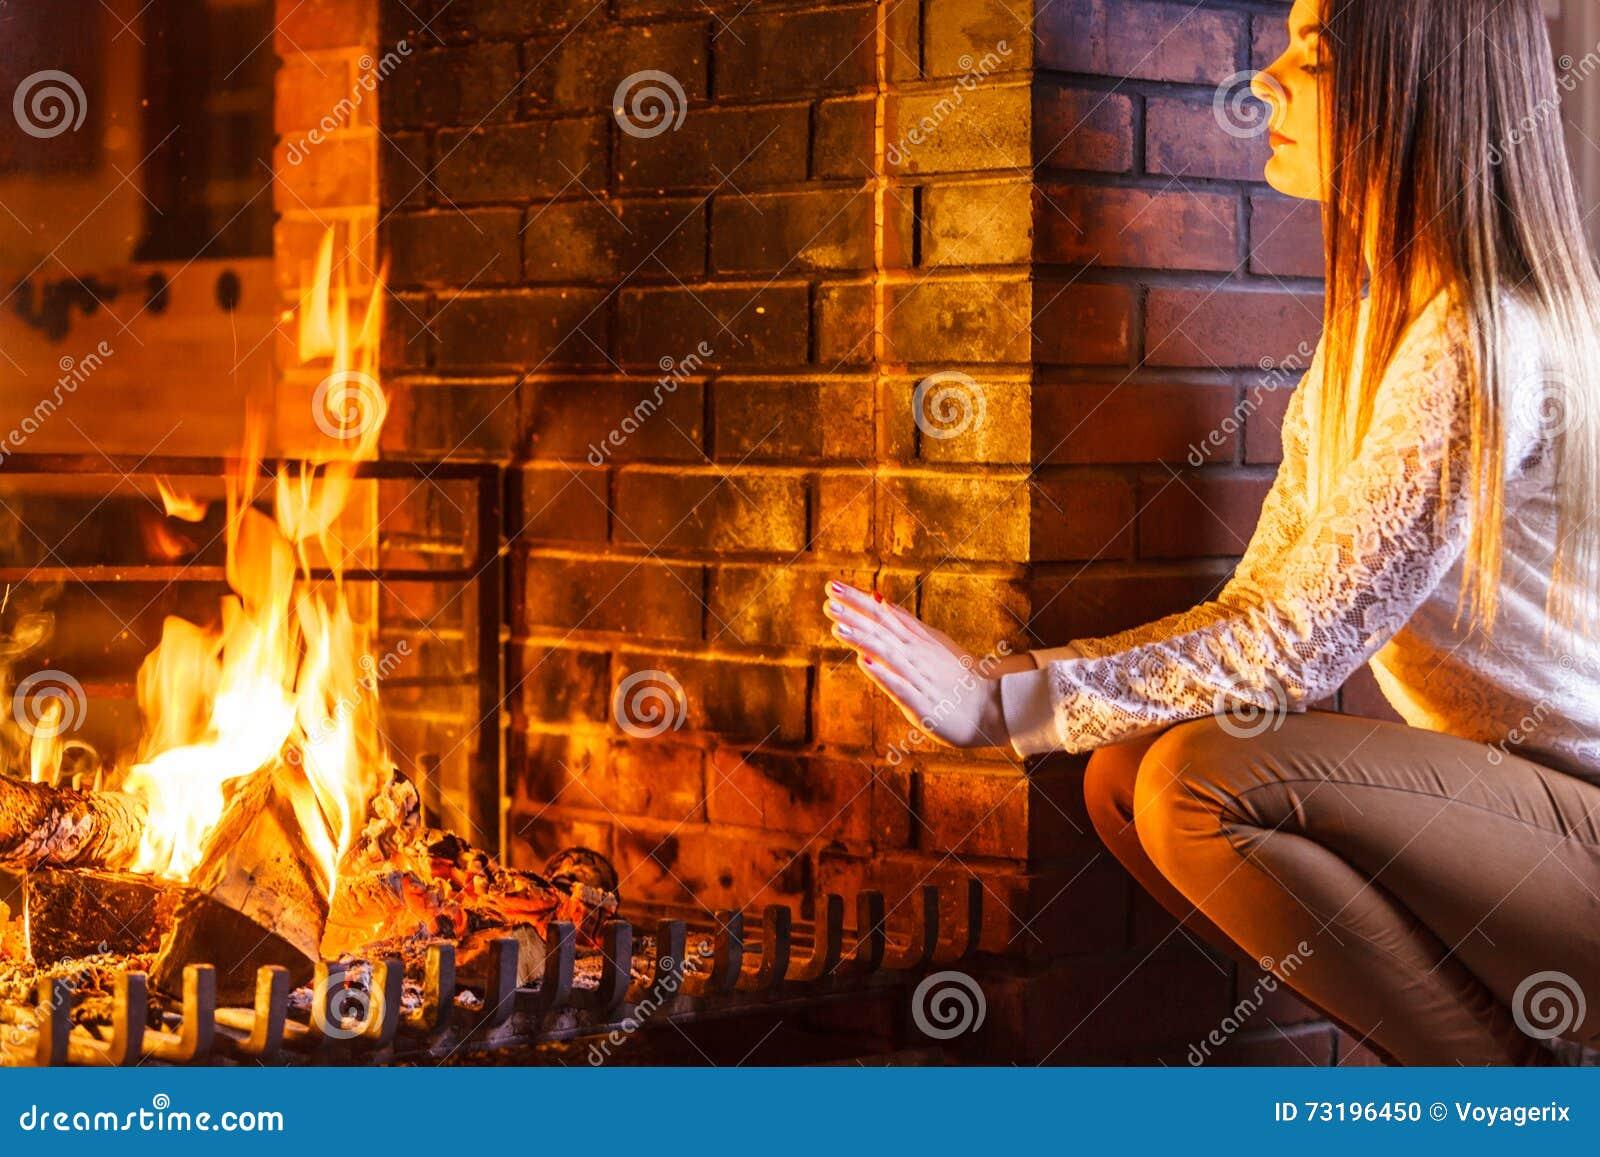 Tellw autunno inverno pu pelle pantofole pantofole calde per casa